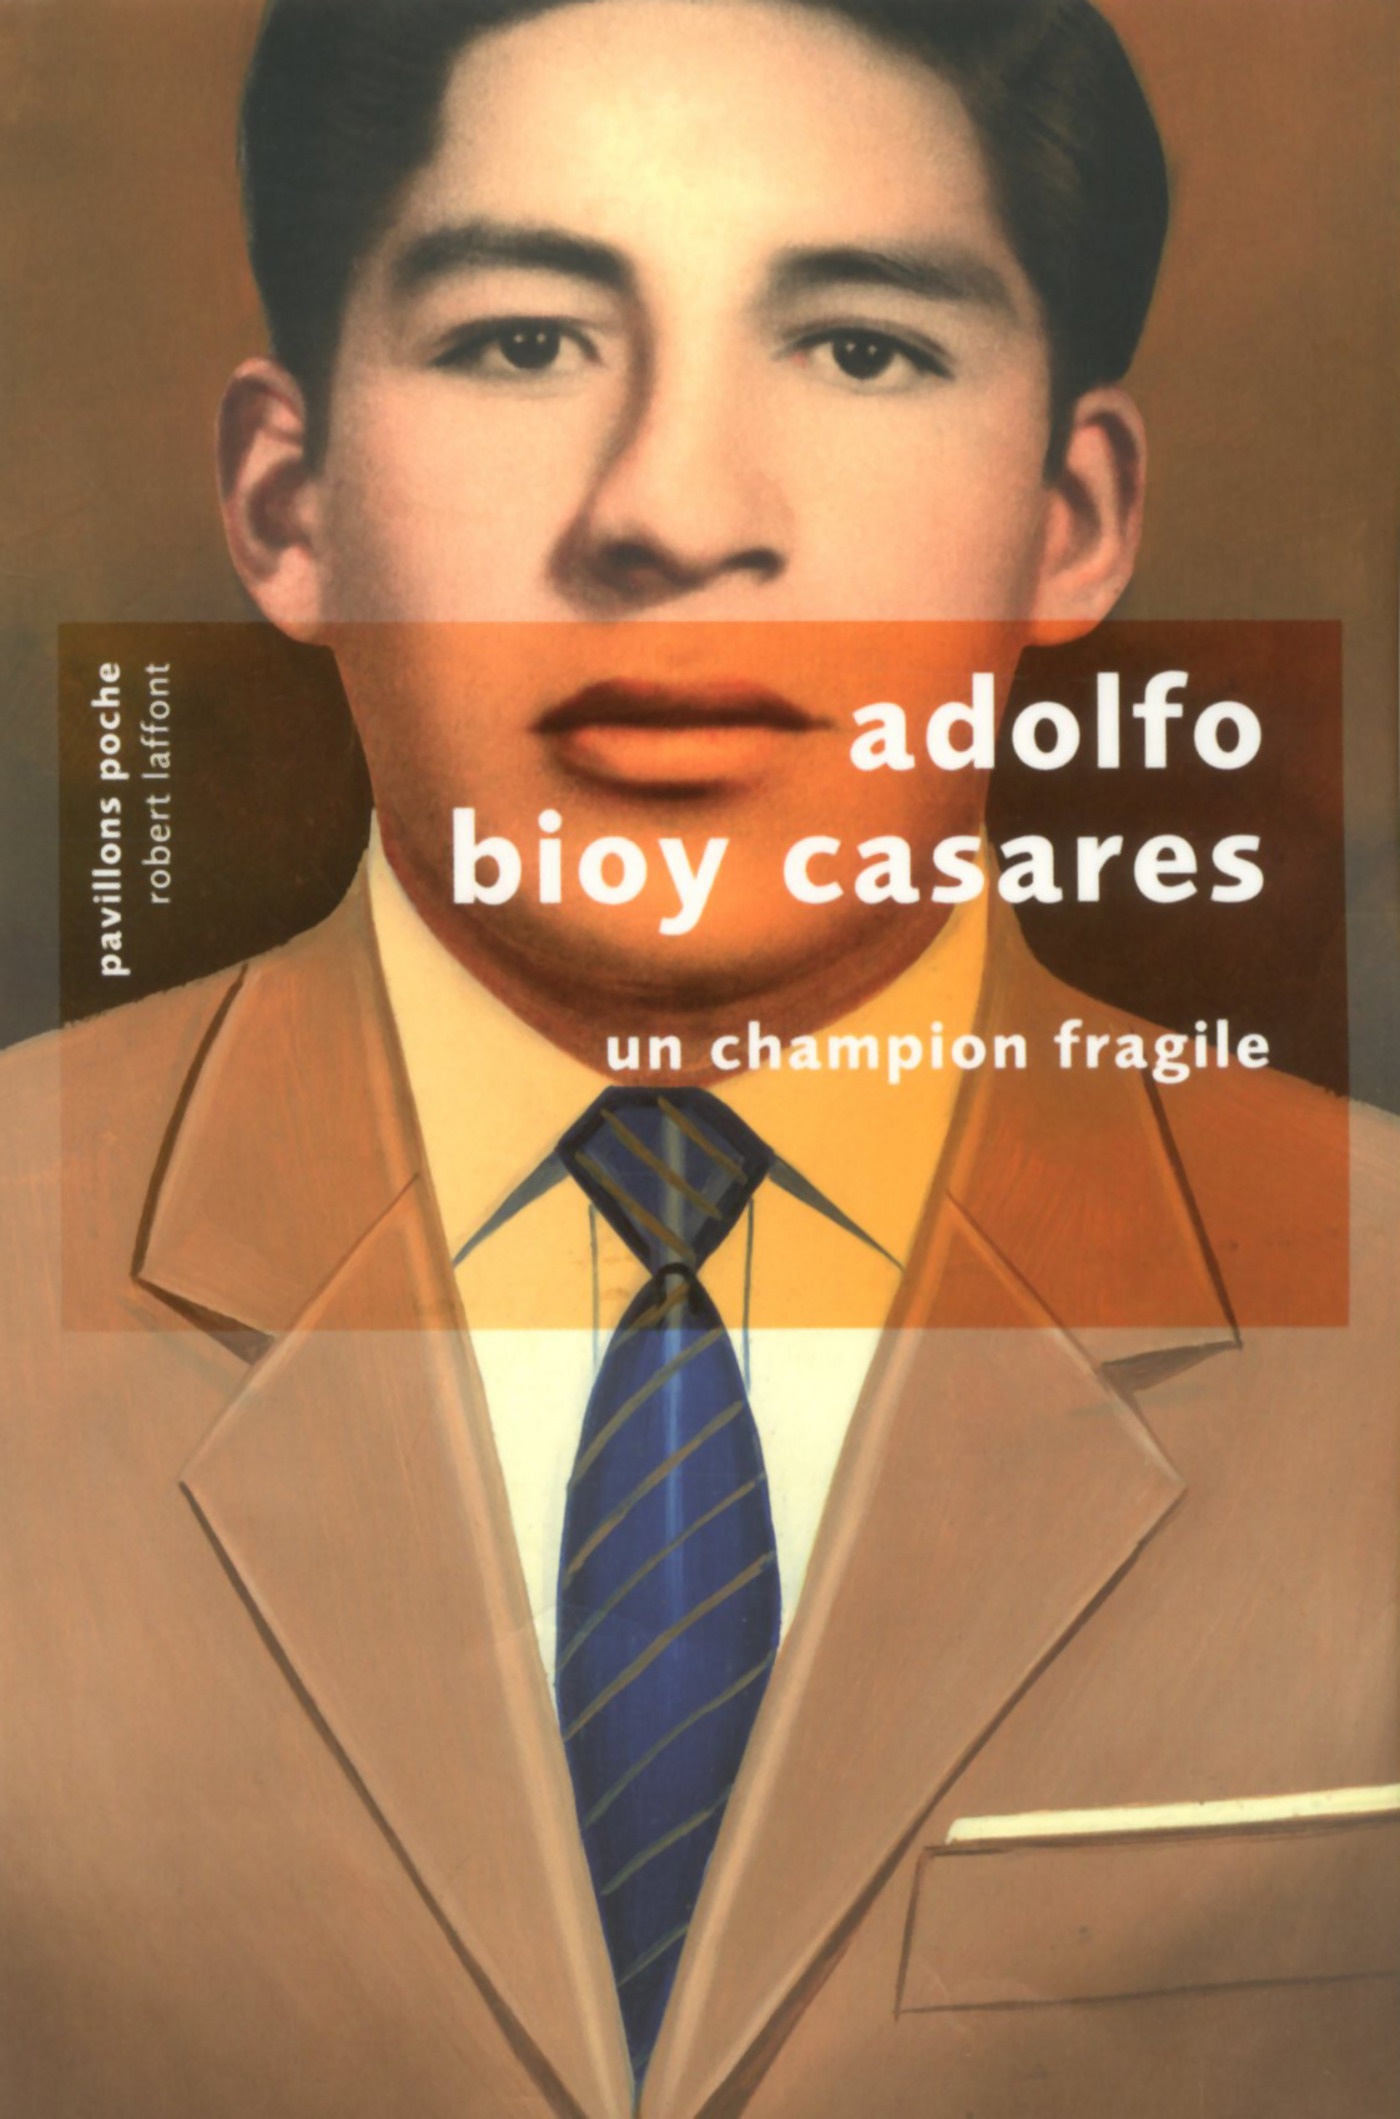 Un champion fragile